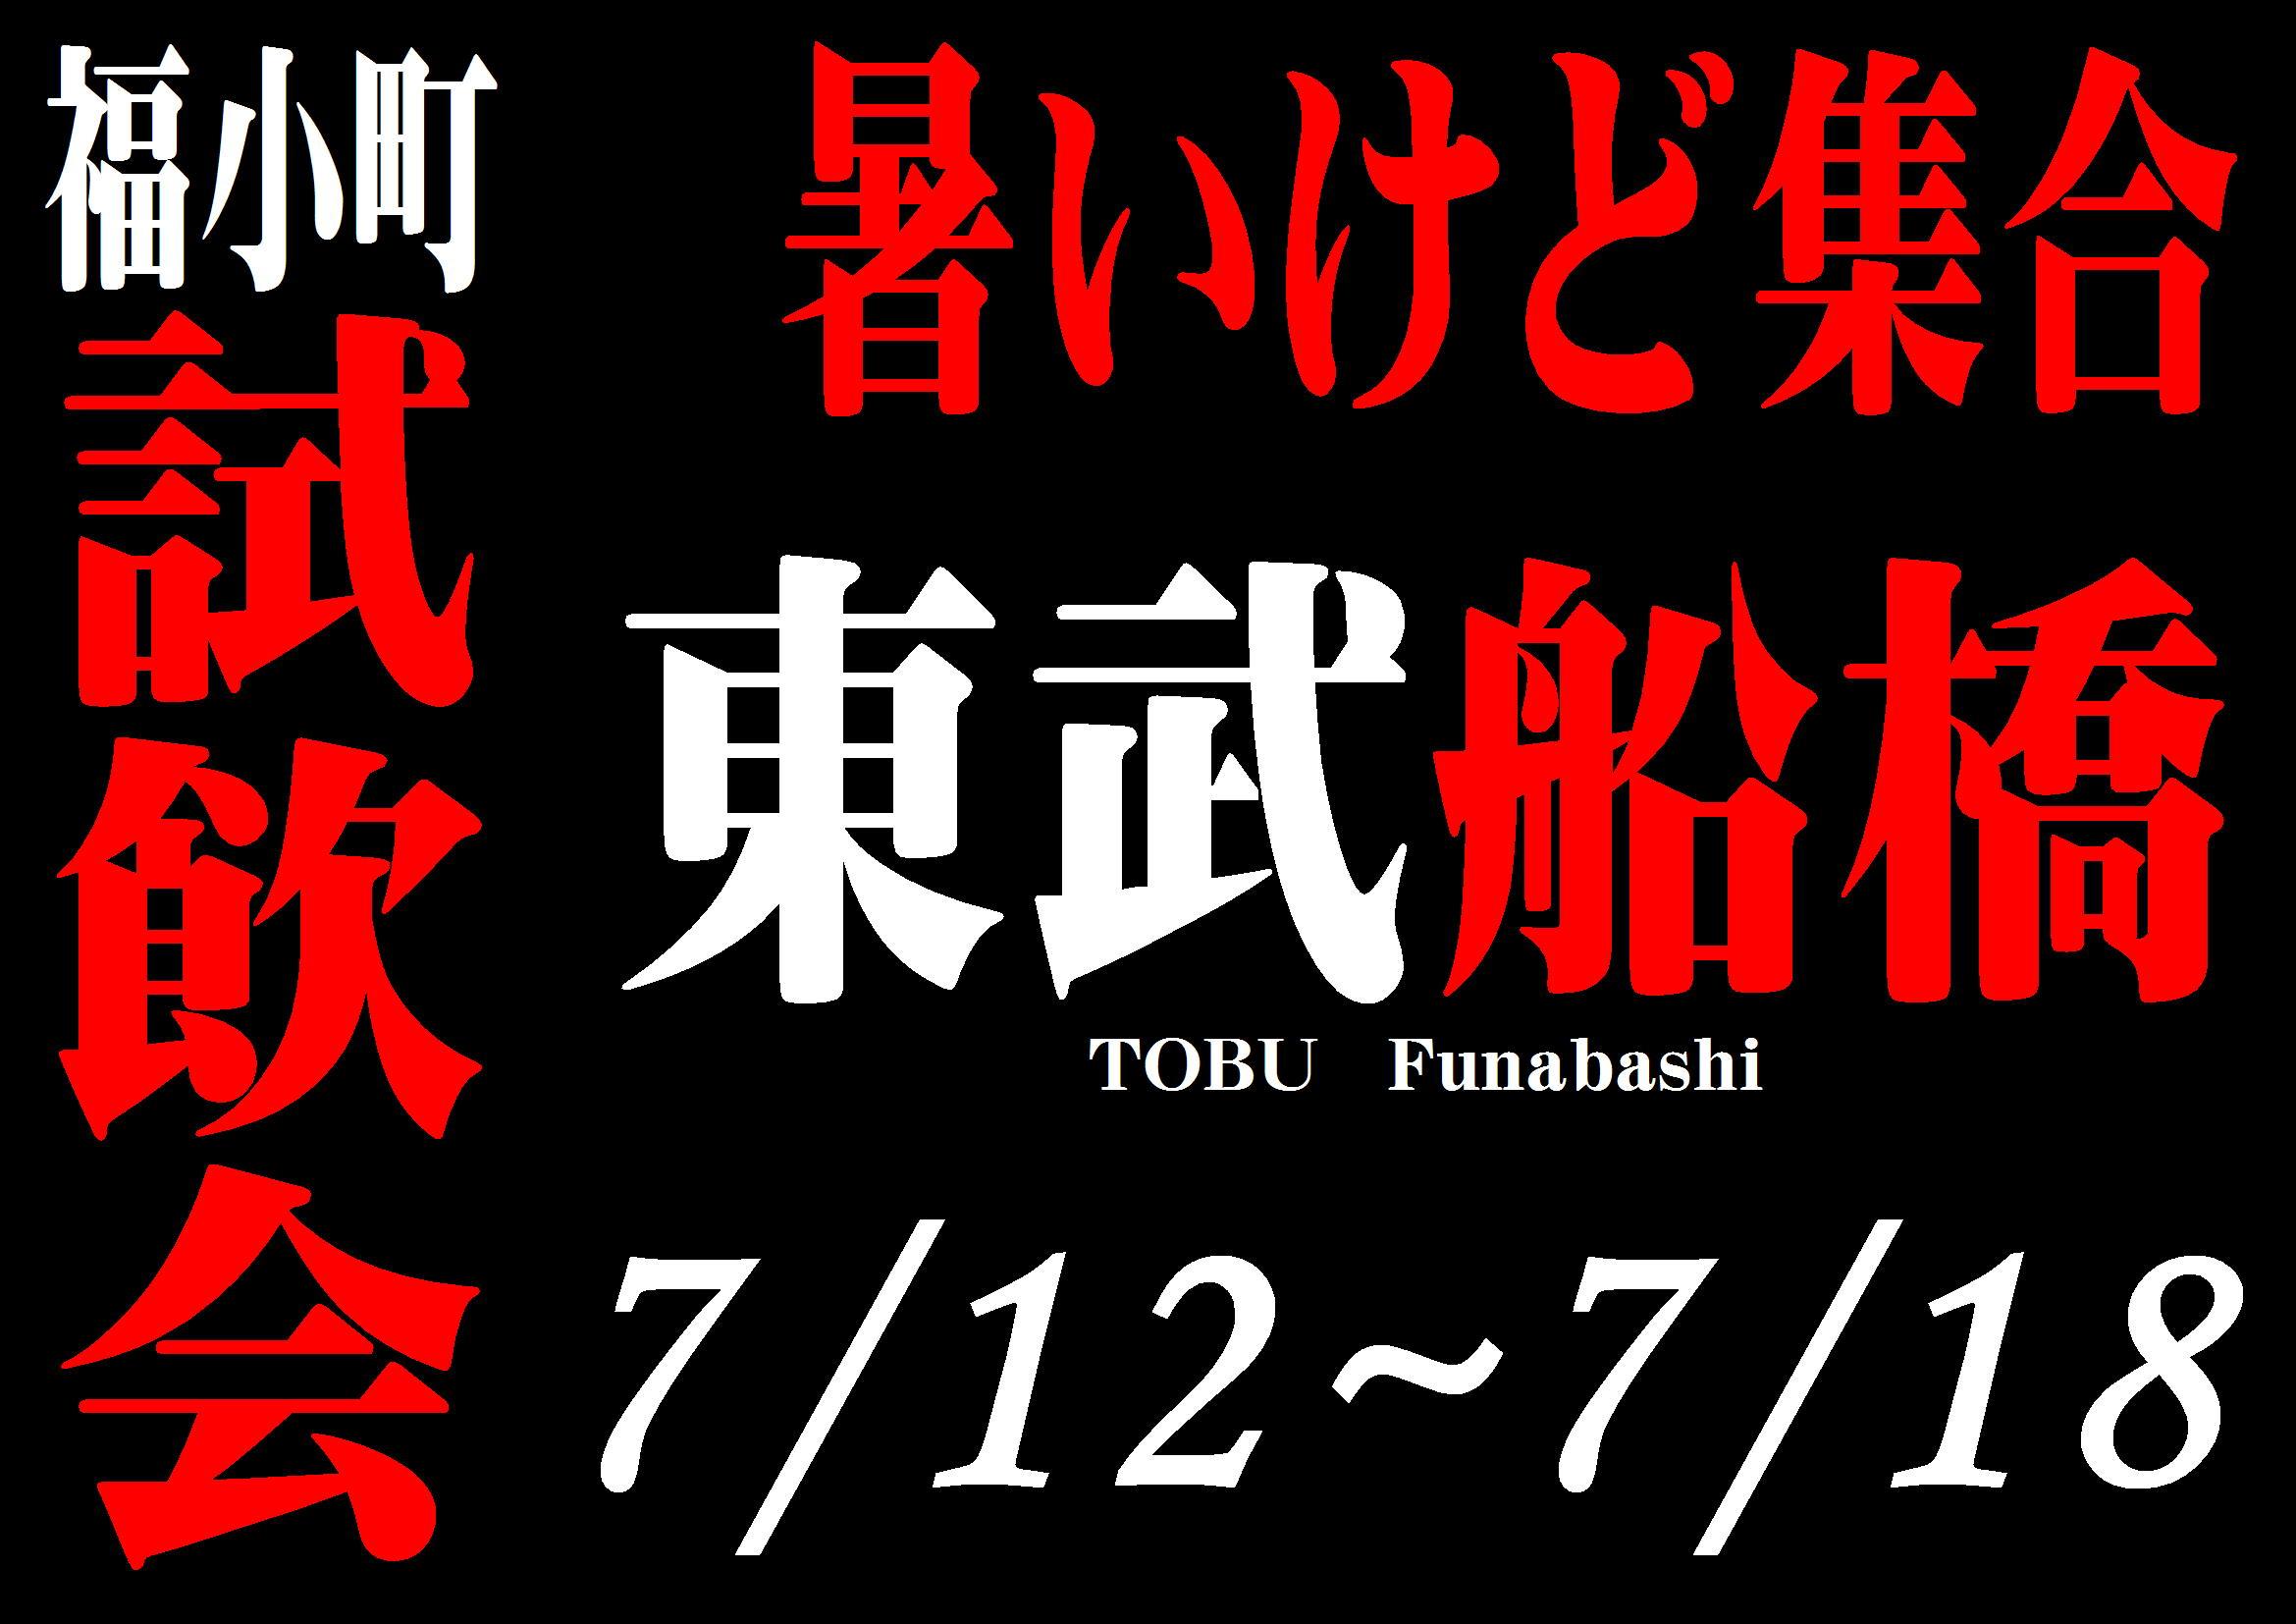 http://www.fukukomachi.com/blog/photo/20170713.JPG